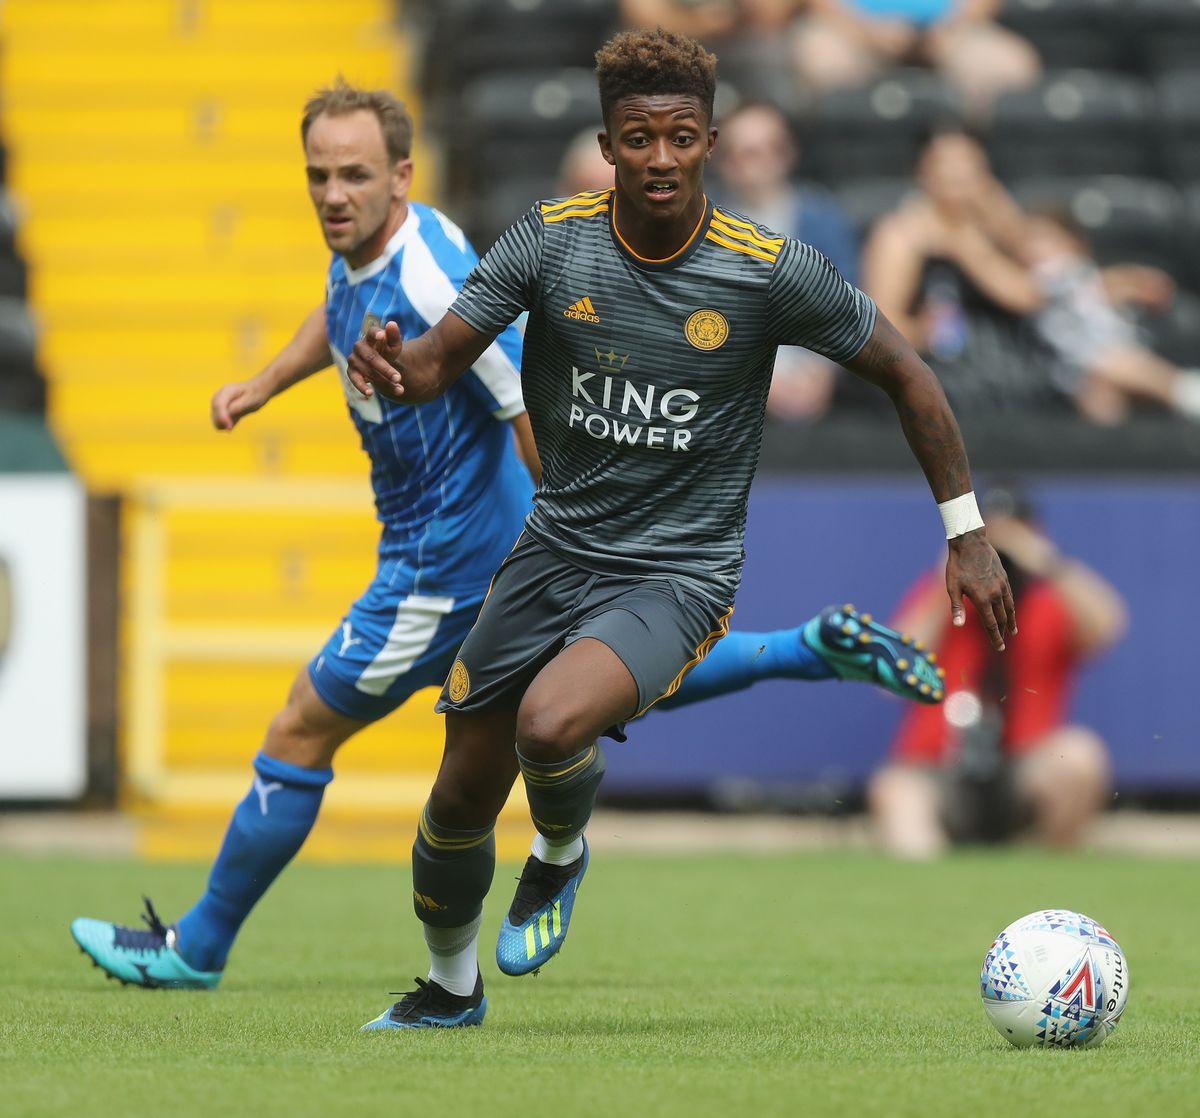 Notts County v Leicester City - Pre-Season Friendly